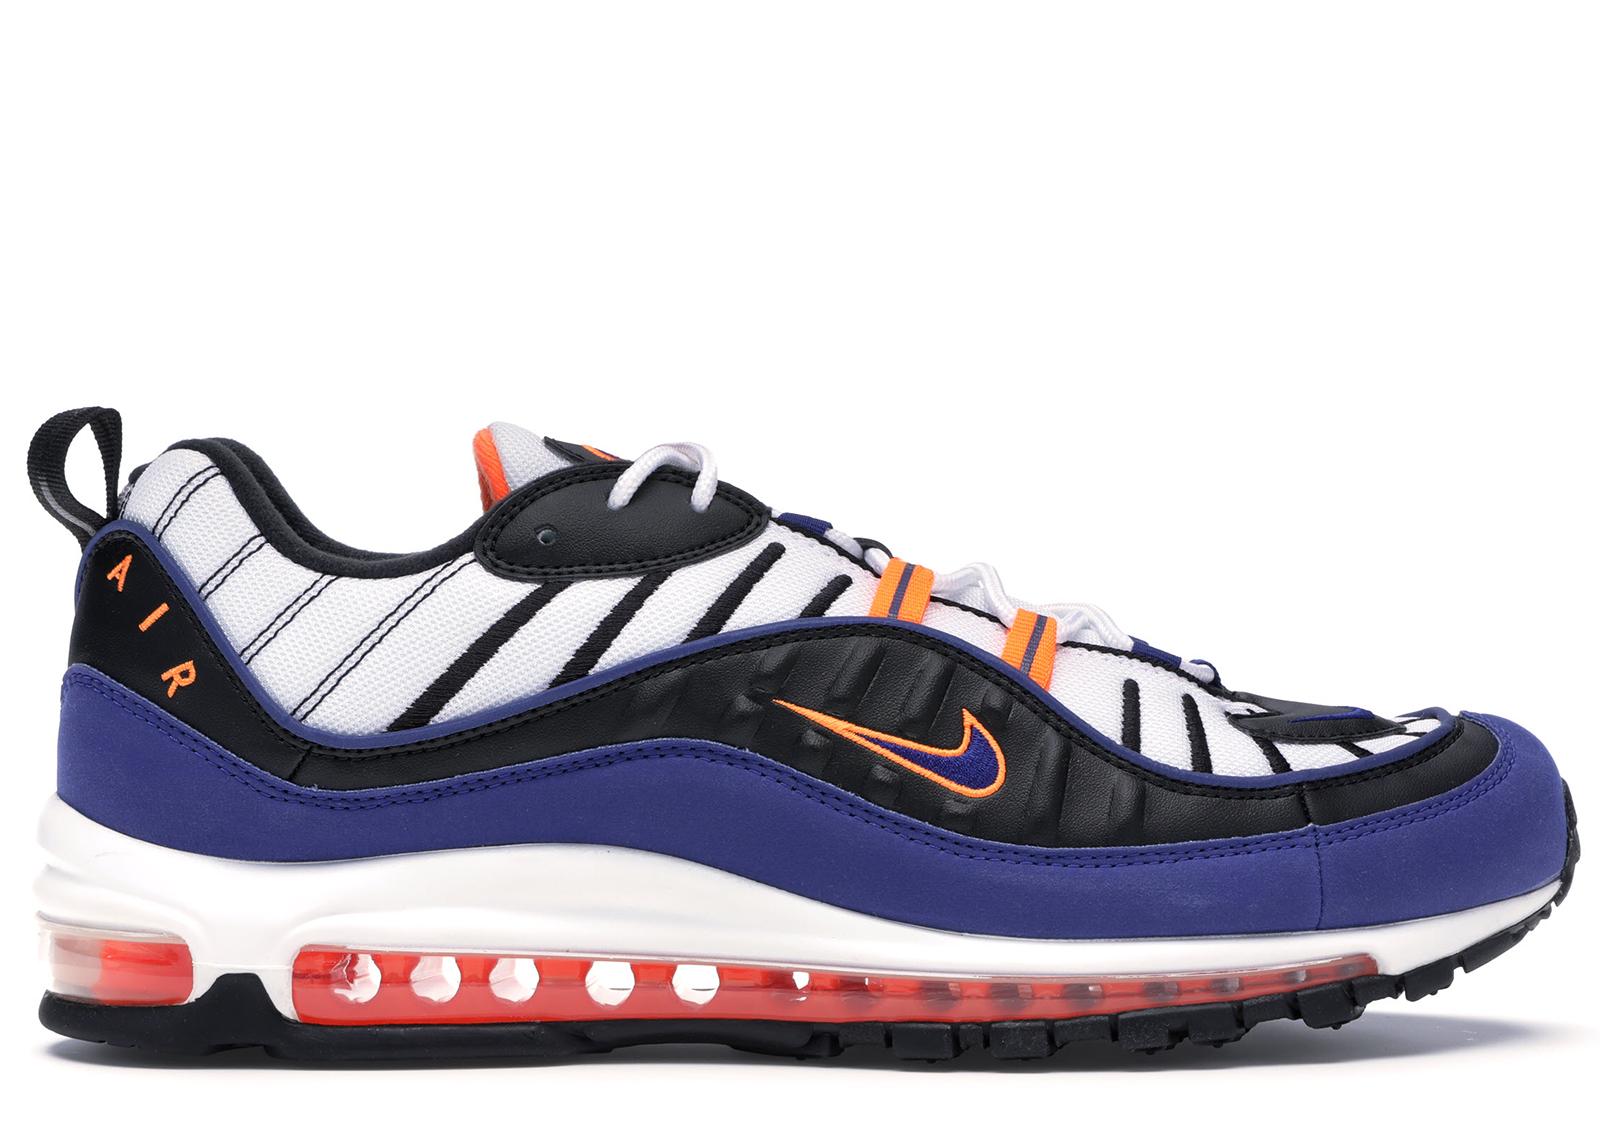 Faut il acheter la Nike Air Max 98 'Passé' Knicks CD1536 100 ?